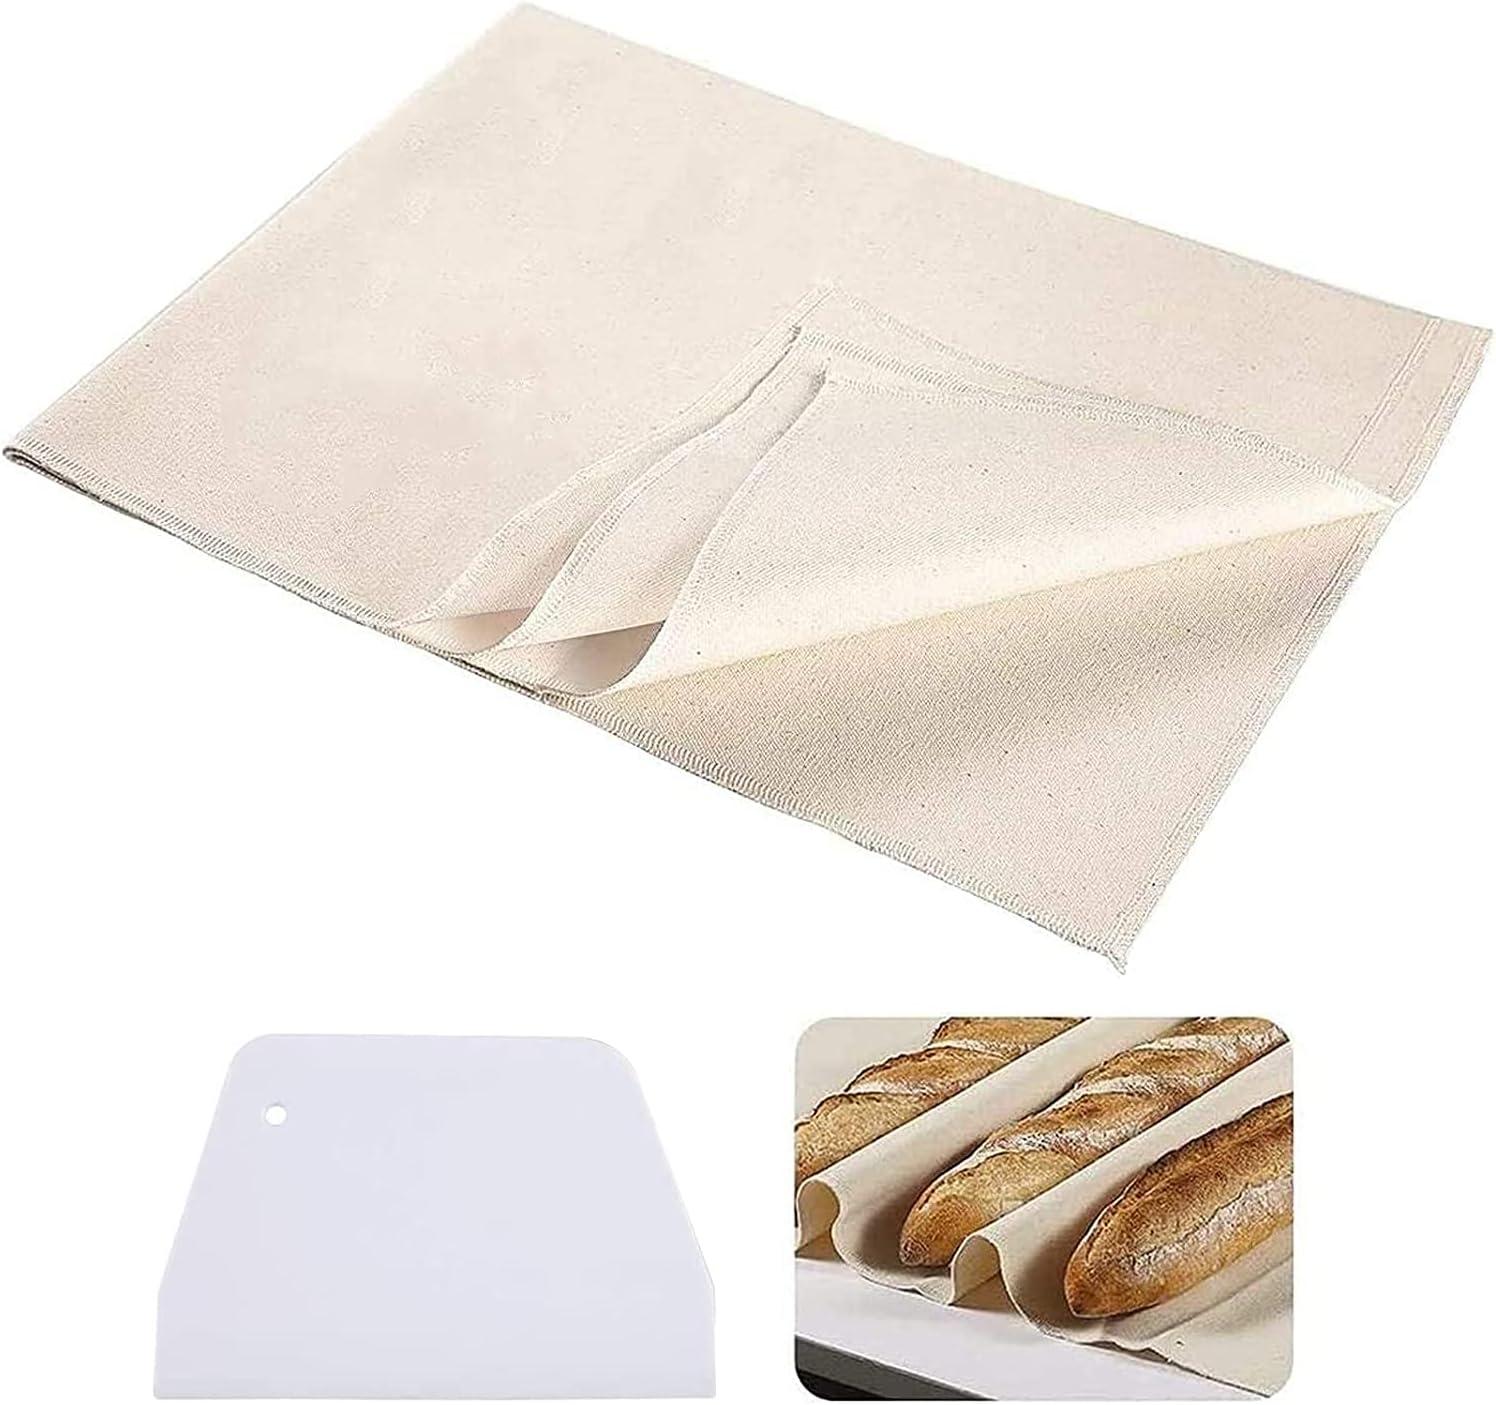 Paño de lino para panadería, paño de lino para fermentación, tela de algodón para hornear masa, panadería, alfombrilla de baguette, bandeja de horneado, accesorio de cocina (70 x 120 cm, 2 unidades)